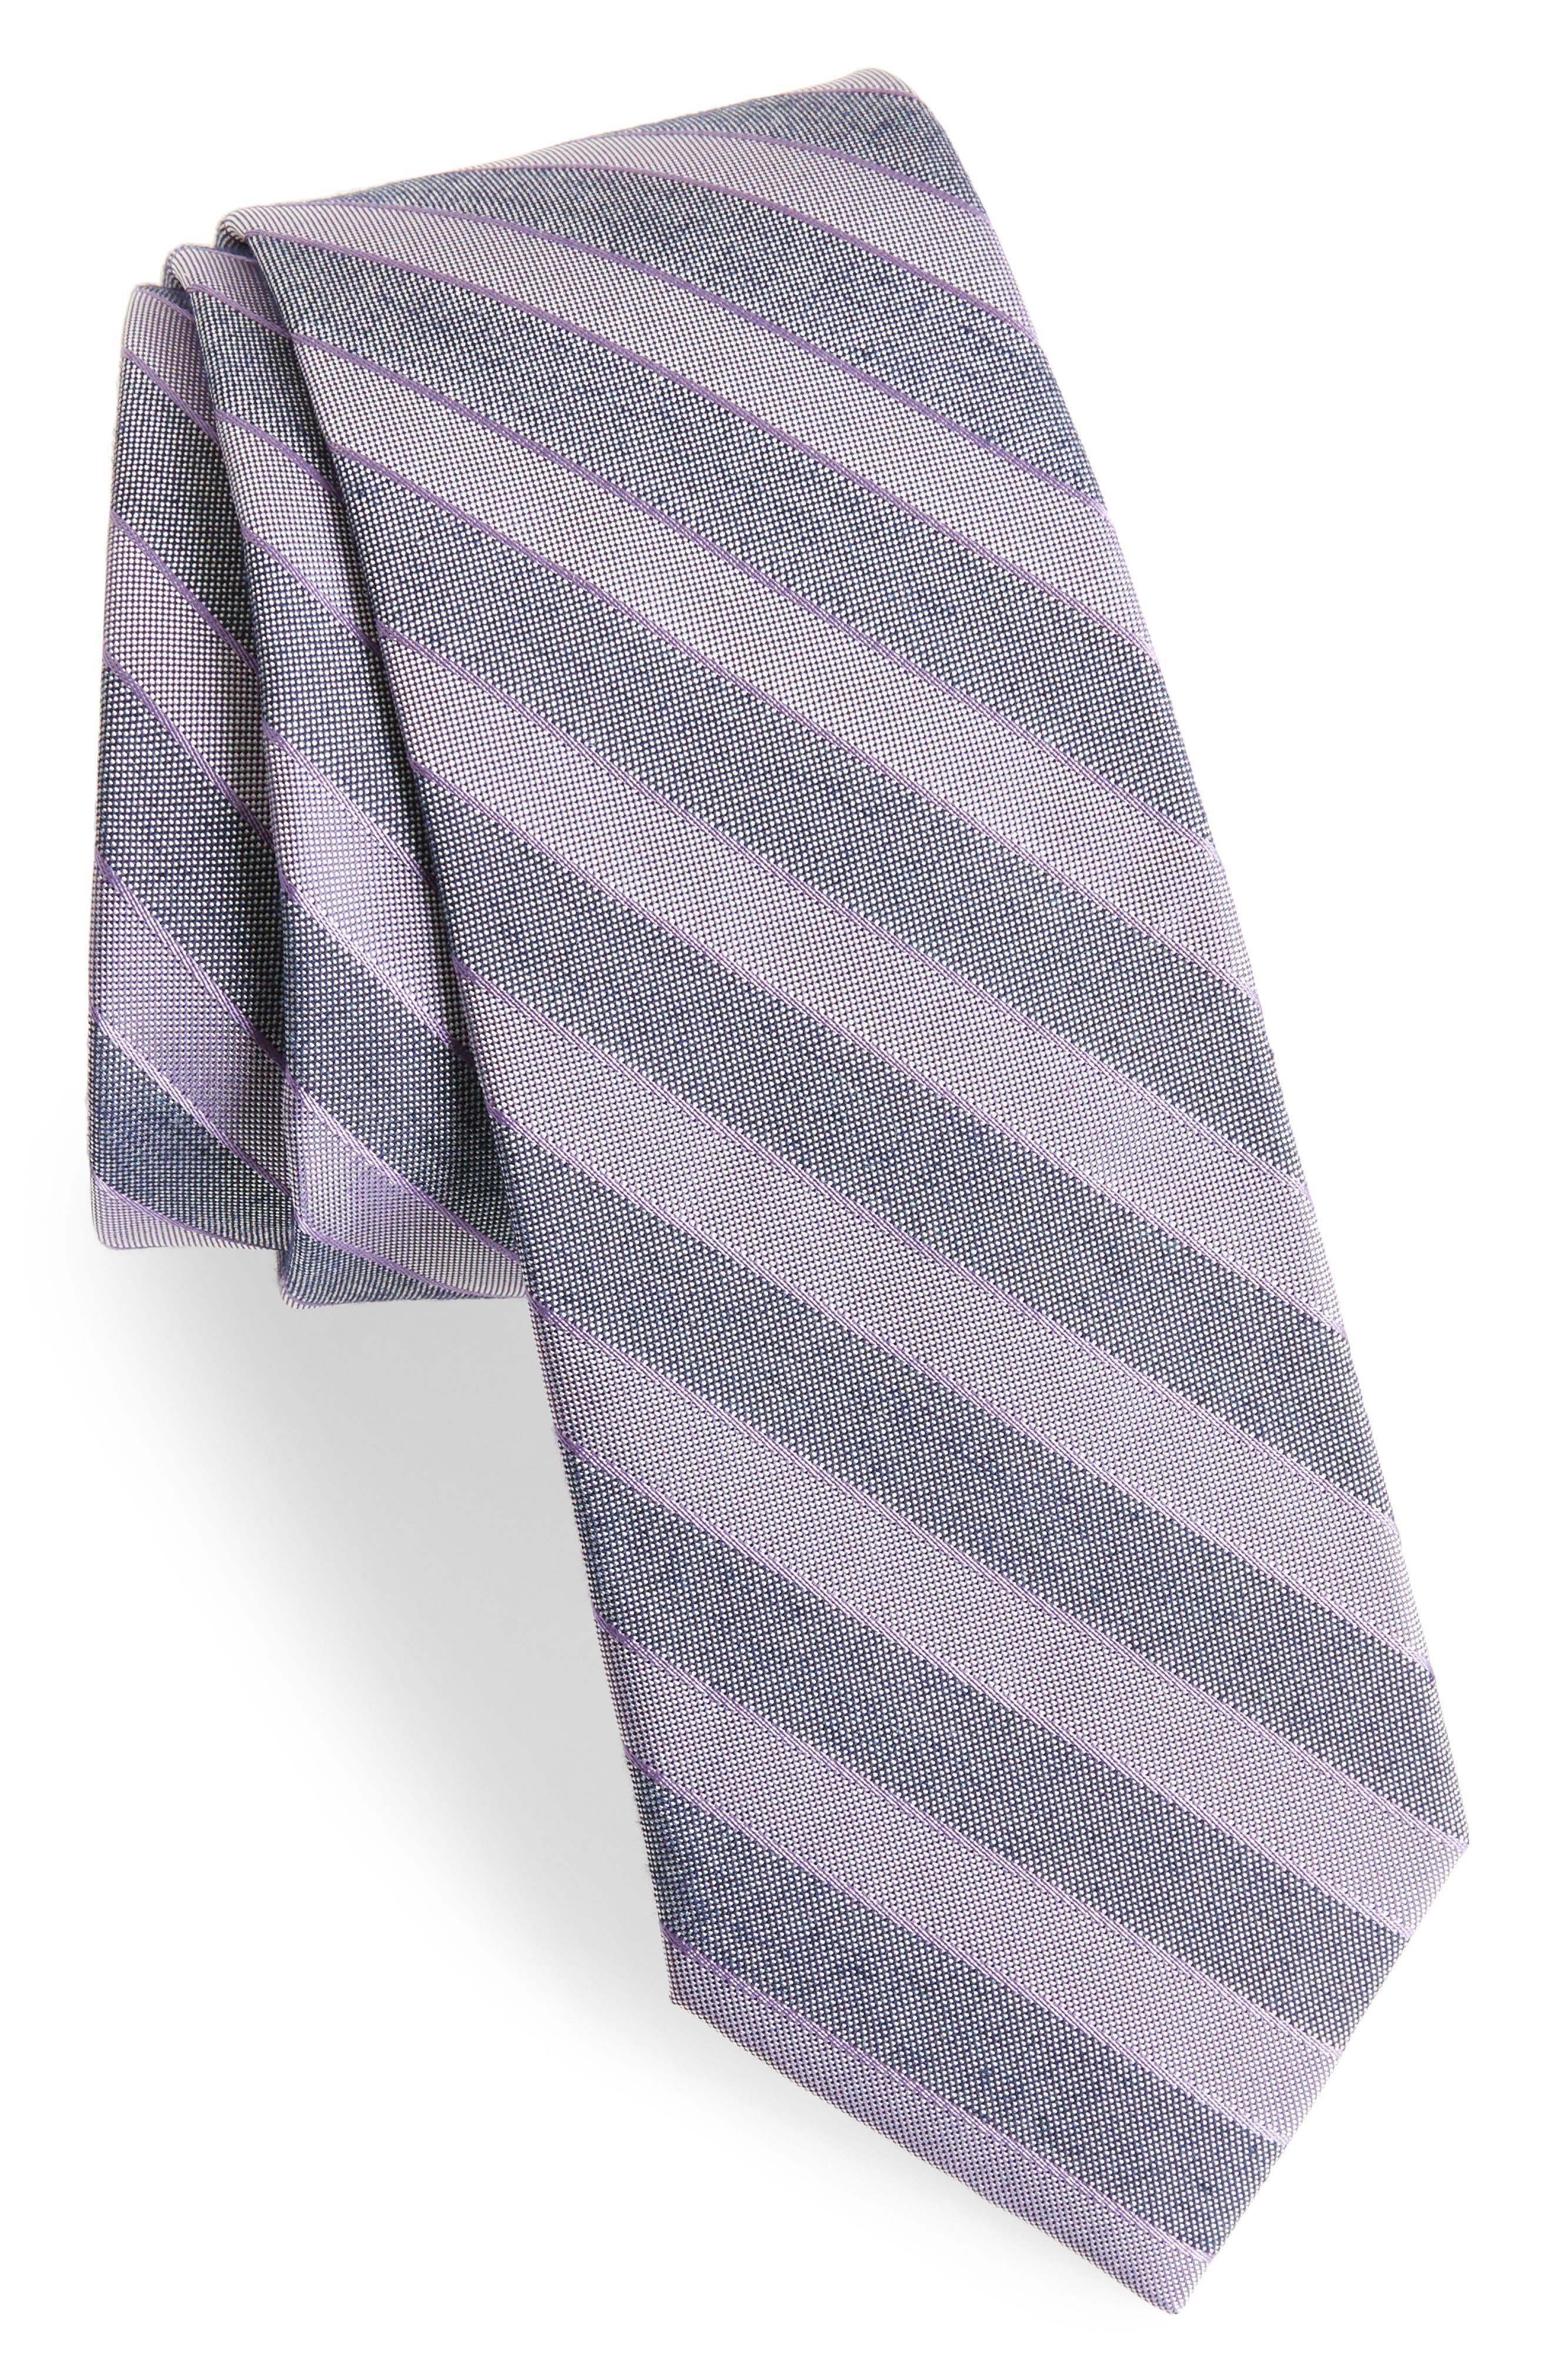 Stripe Silk Blend Skinny Tie,                             Main thumbnail 1, color,                             Purple